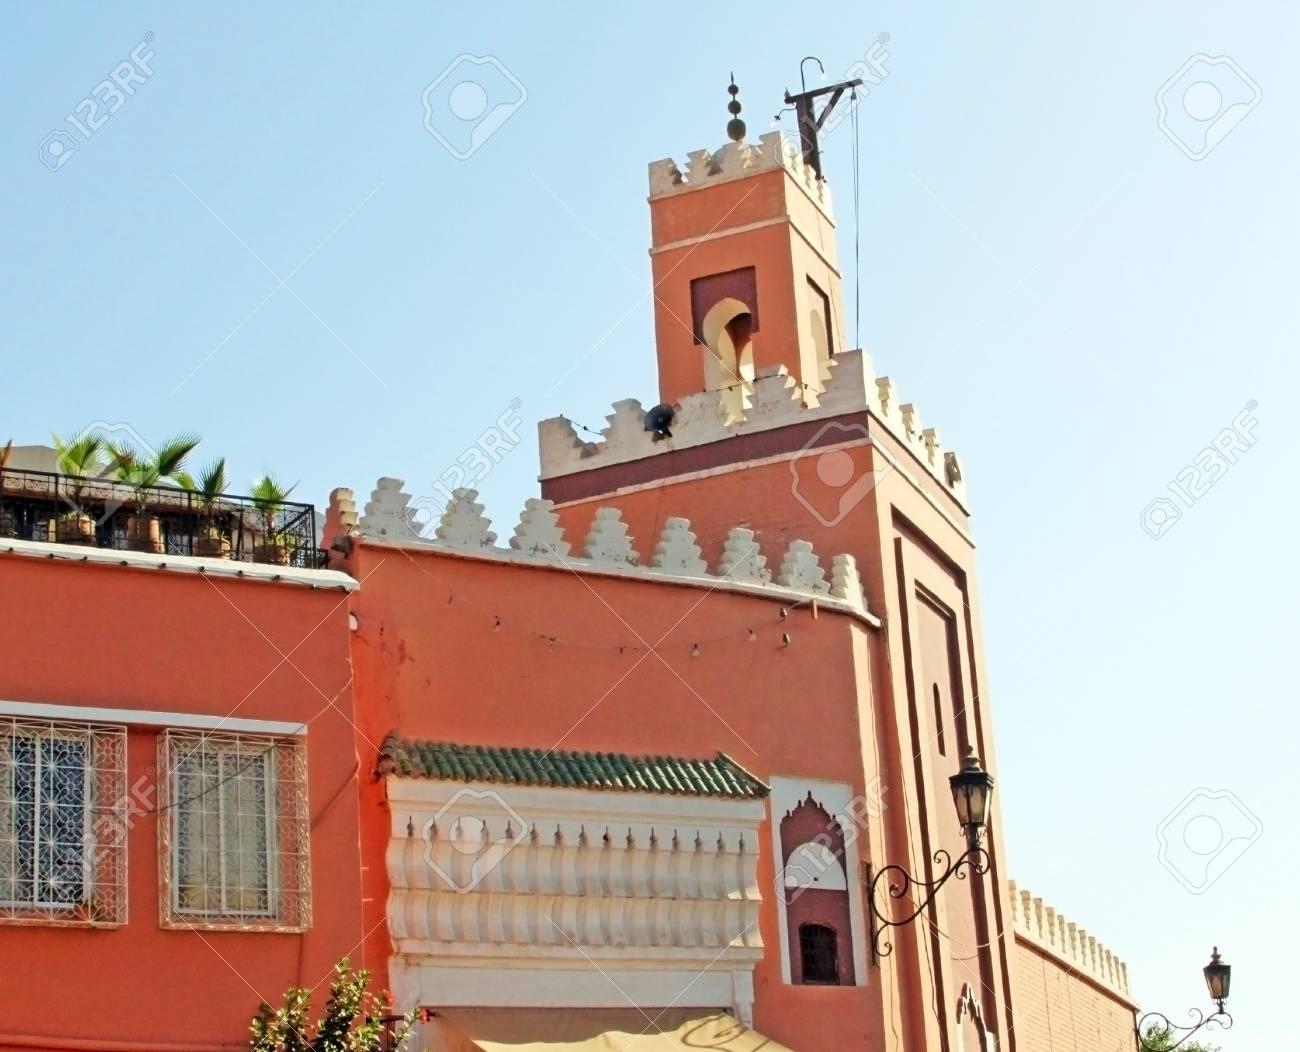 Mosque in Marrakesh, Morocco Stock Photo - 15405269